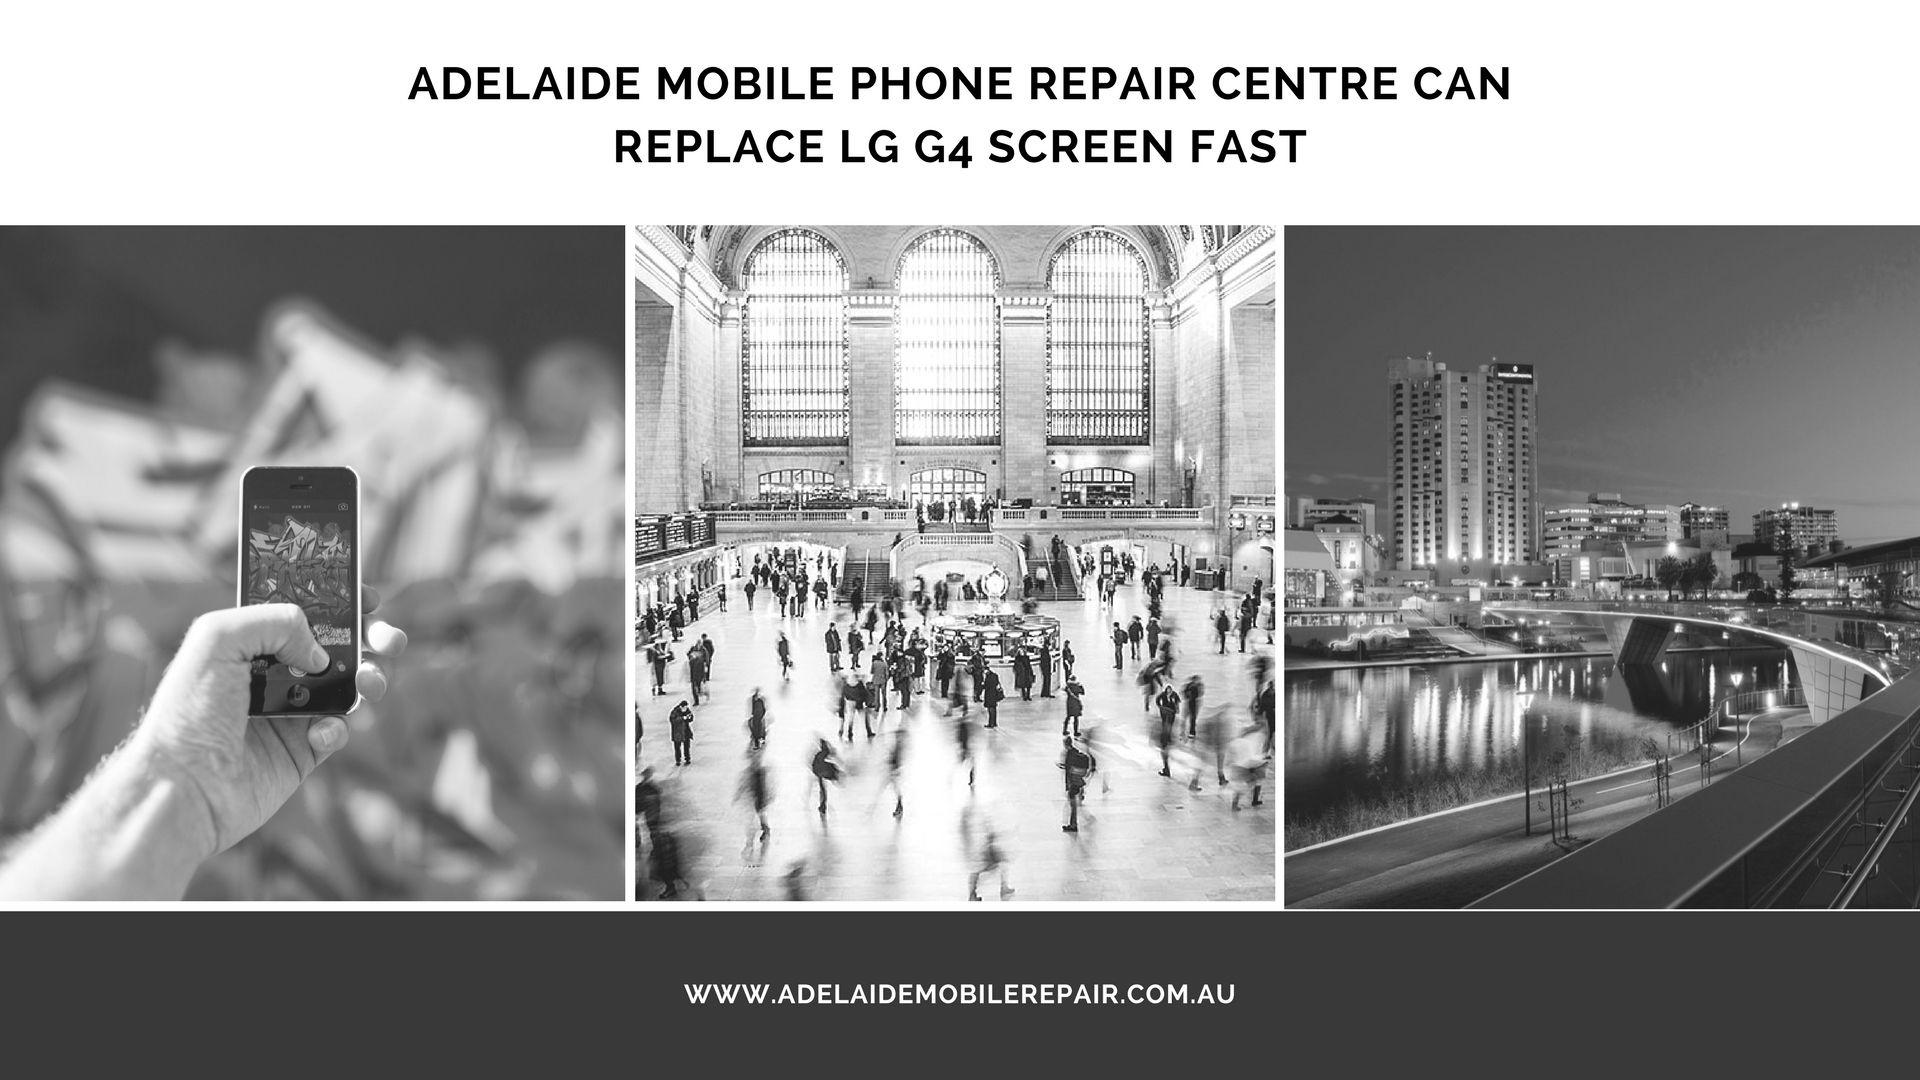 Adelaide mobile phone repair centre can replace lgg4